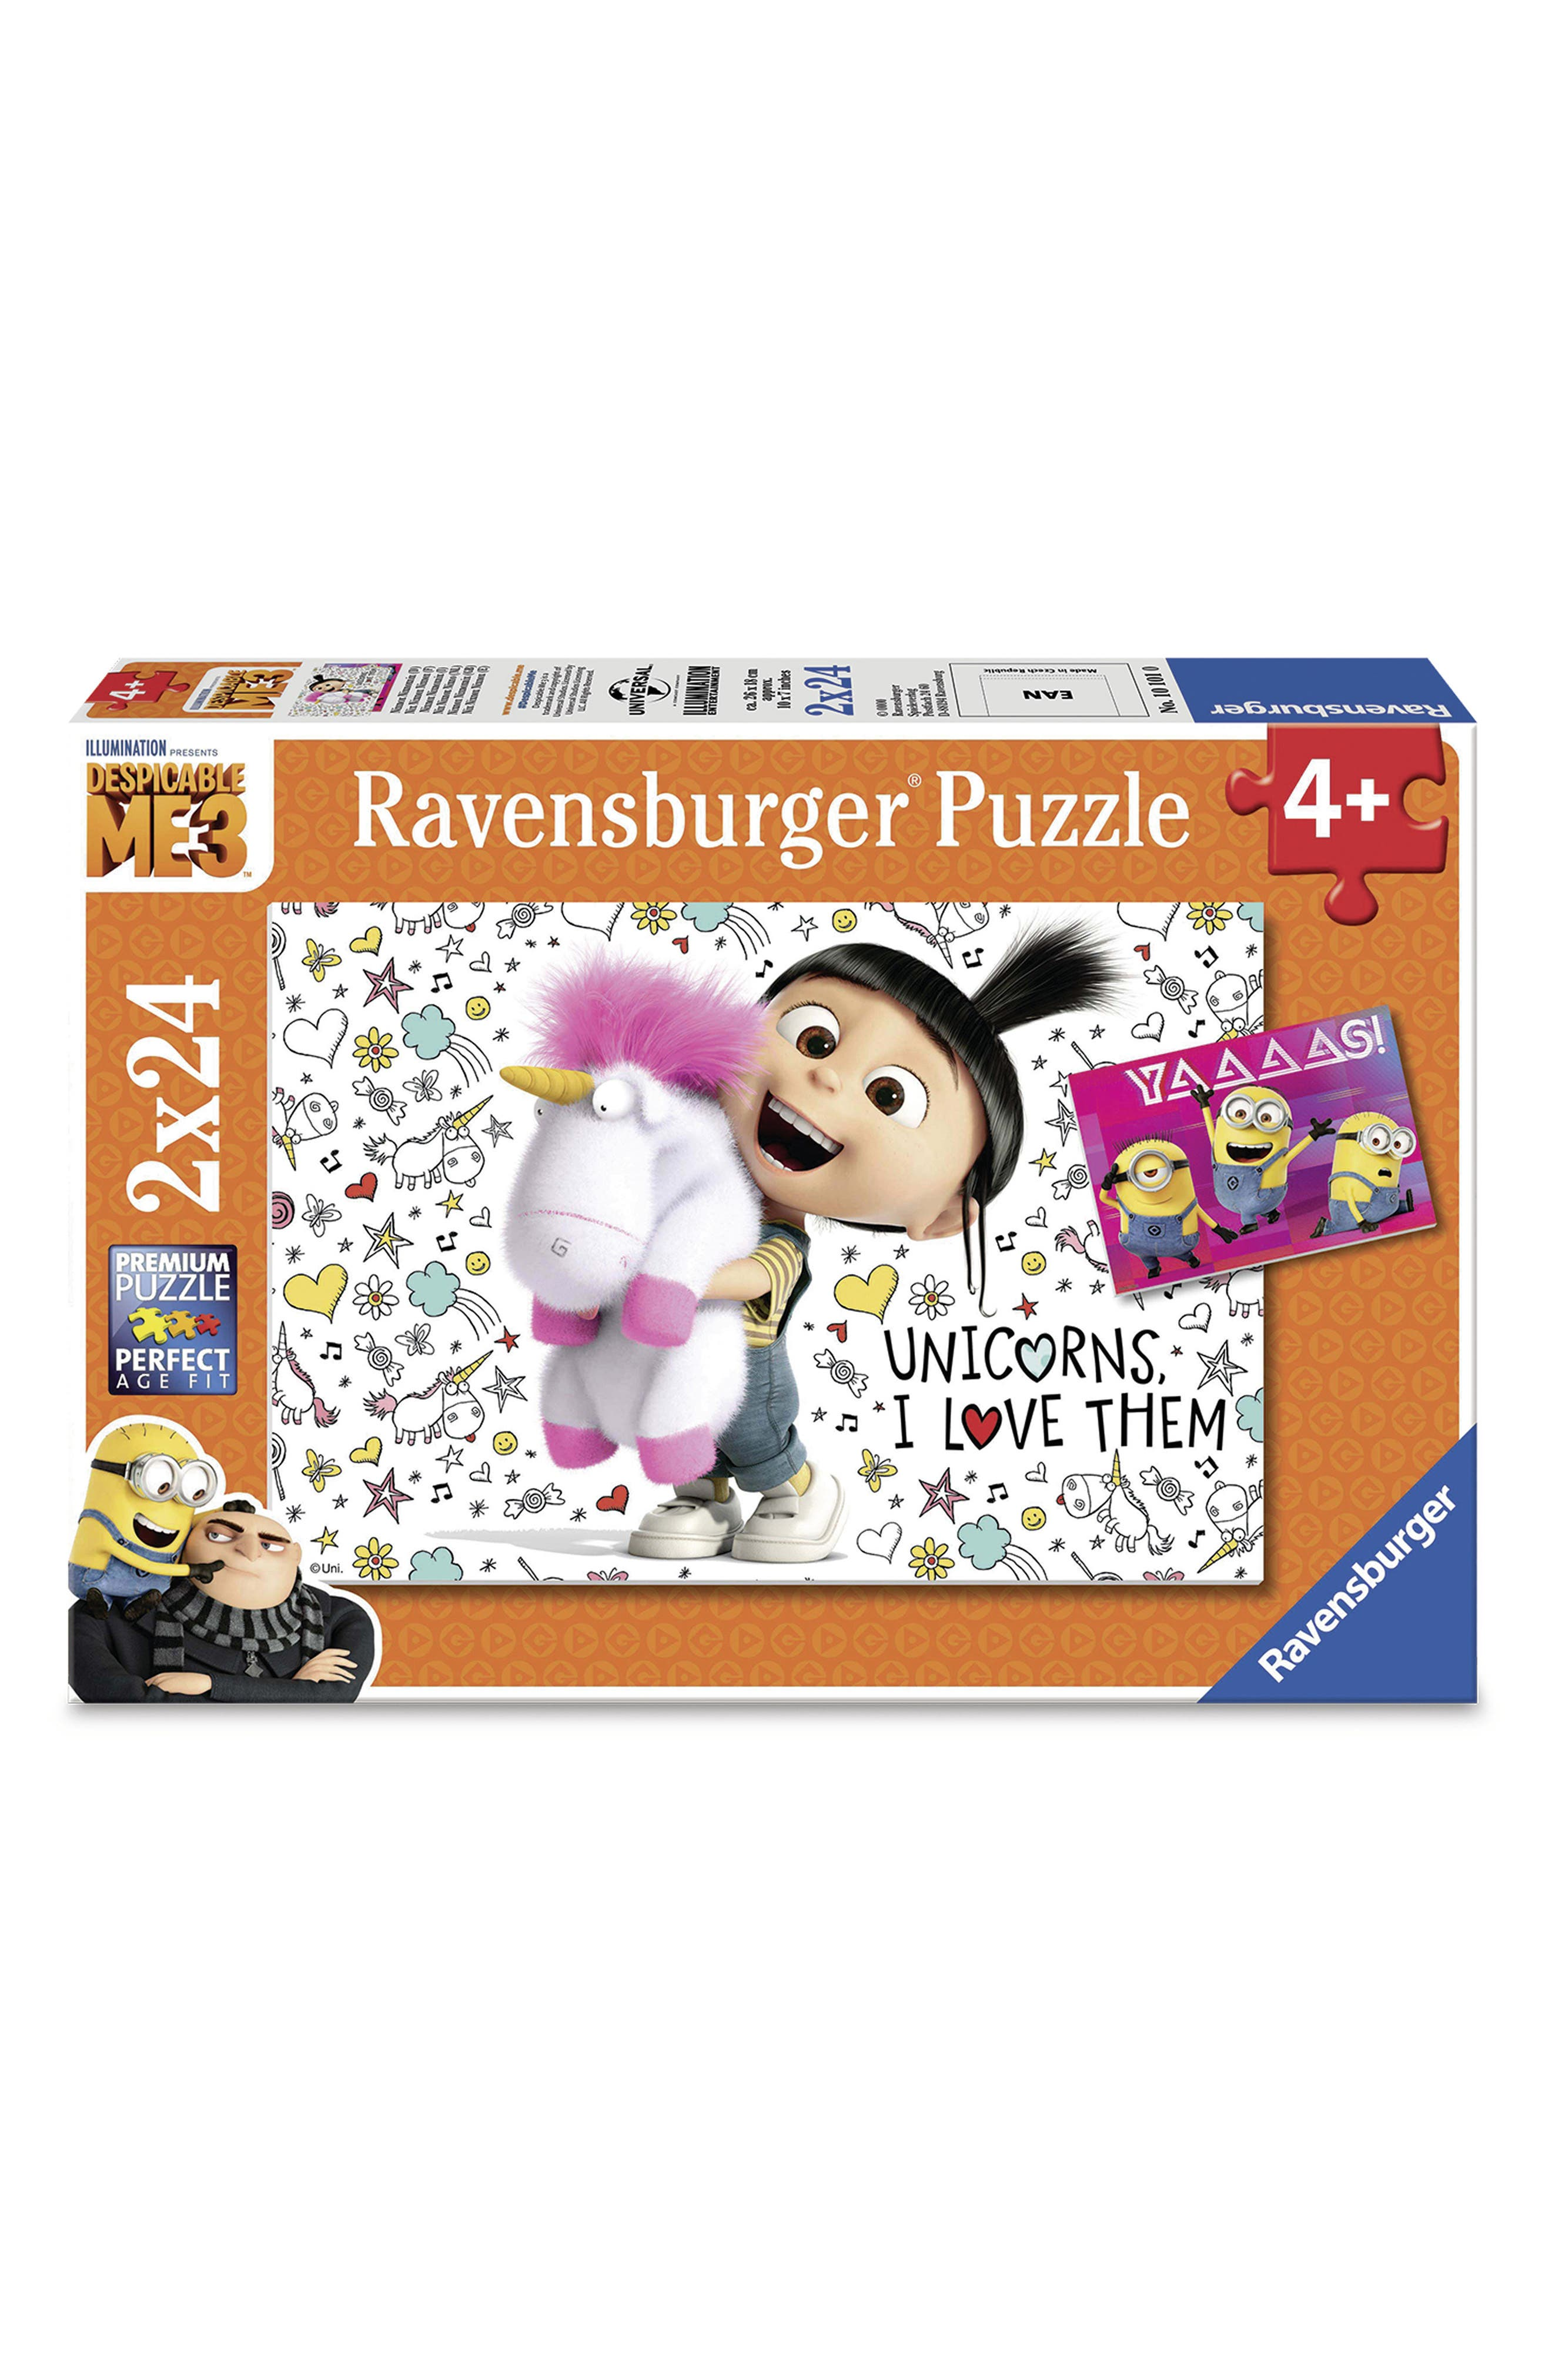 'Despicable Me 3' Set of 2 24-Piece Jigsaw Puzzles,                             Main thumbnail 1, color,                             700